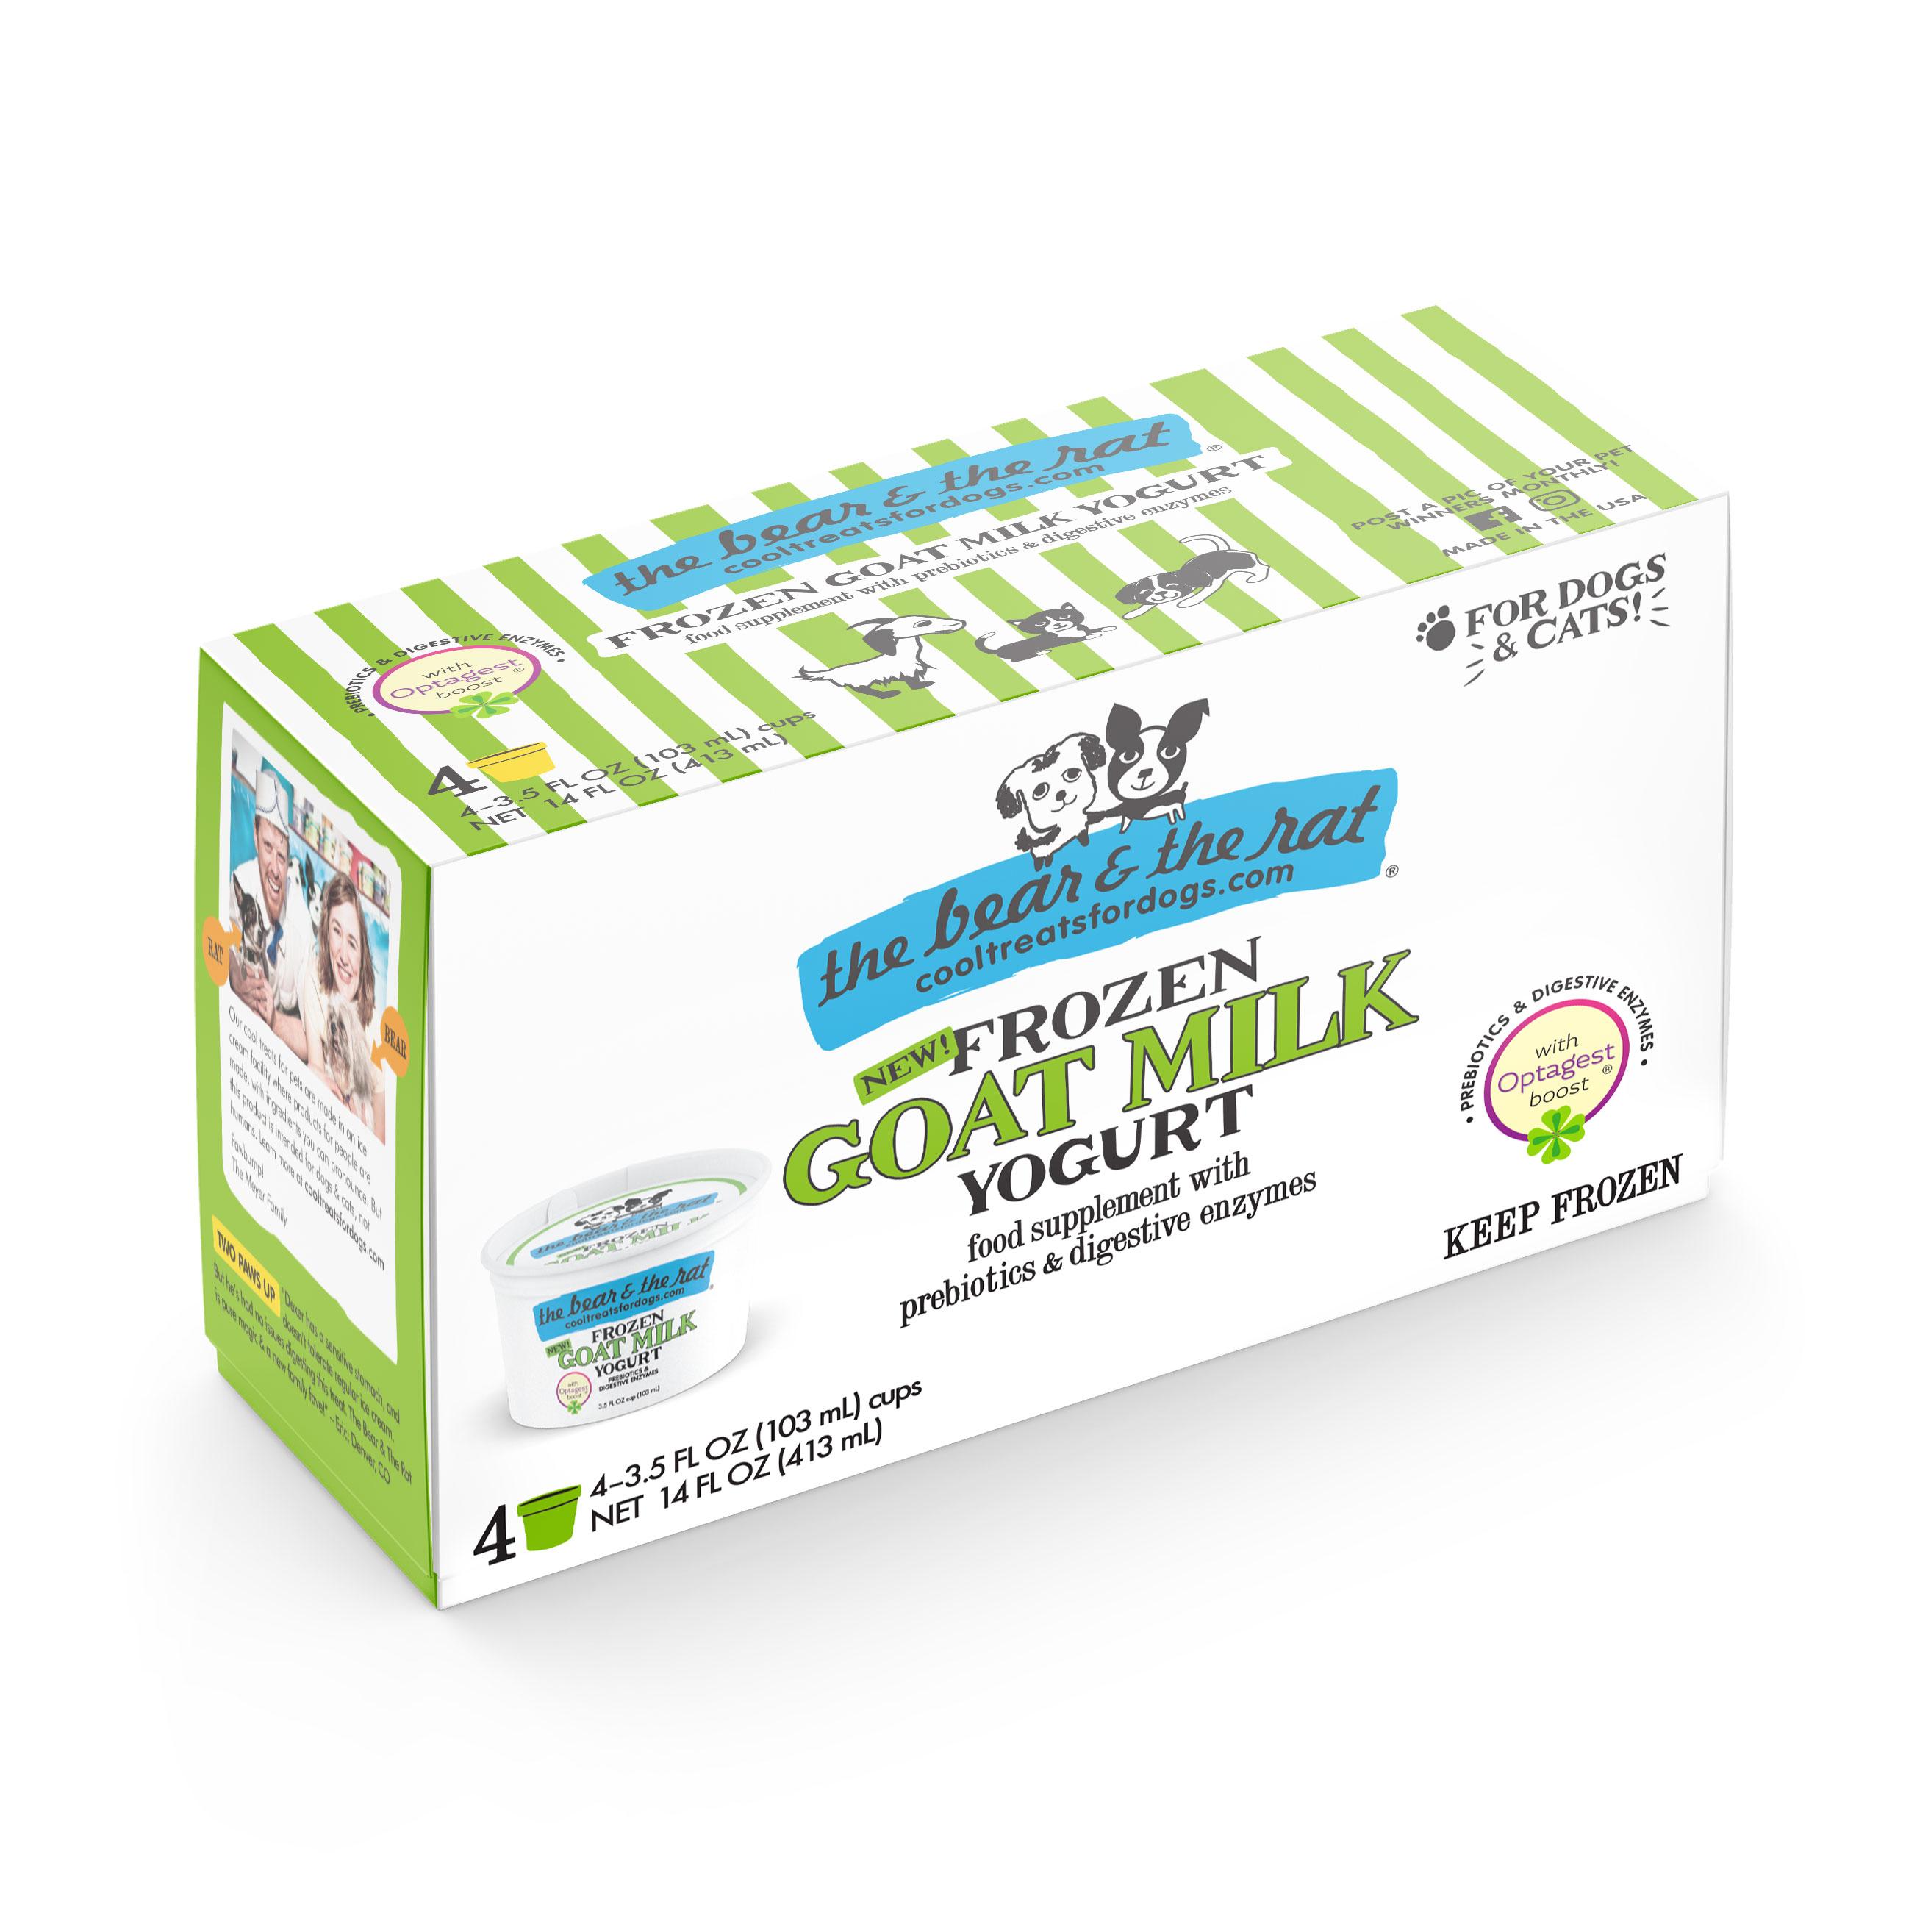 The Bear & The Rat Goat Milk Frozen Yogurt Dog & Cat Treats, 3.5-oz, 4-pack